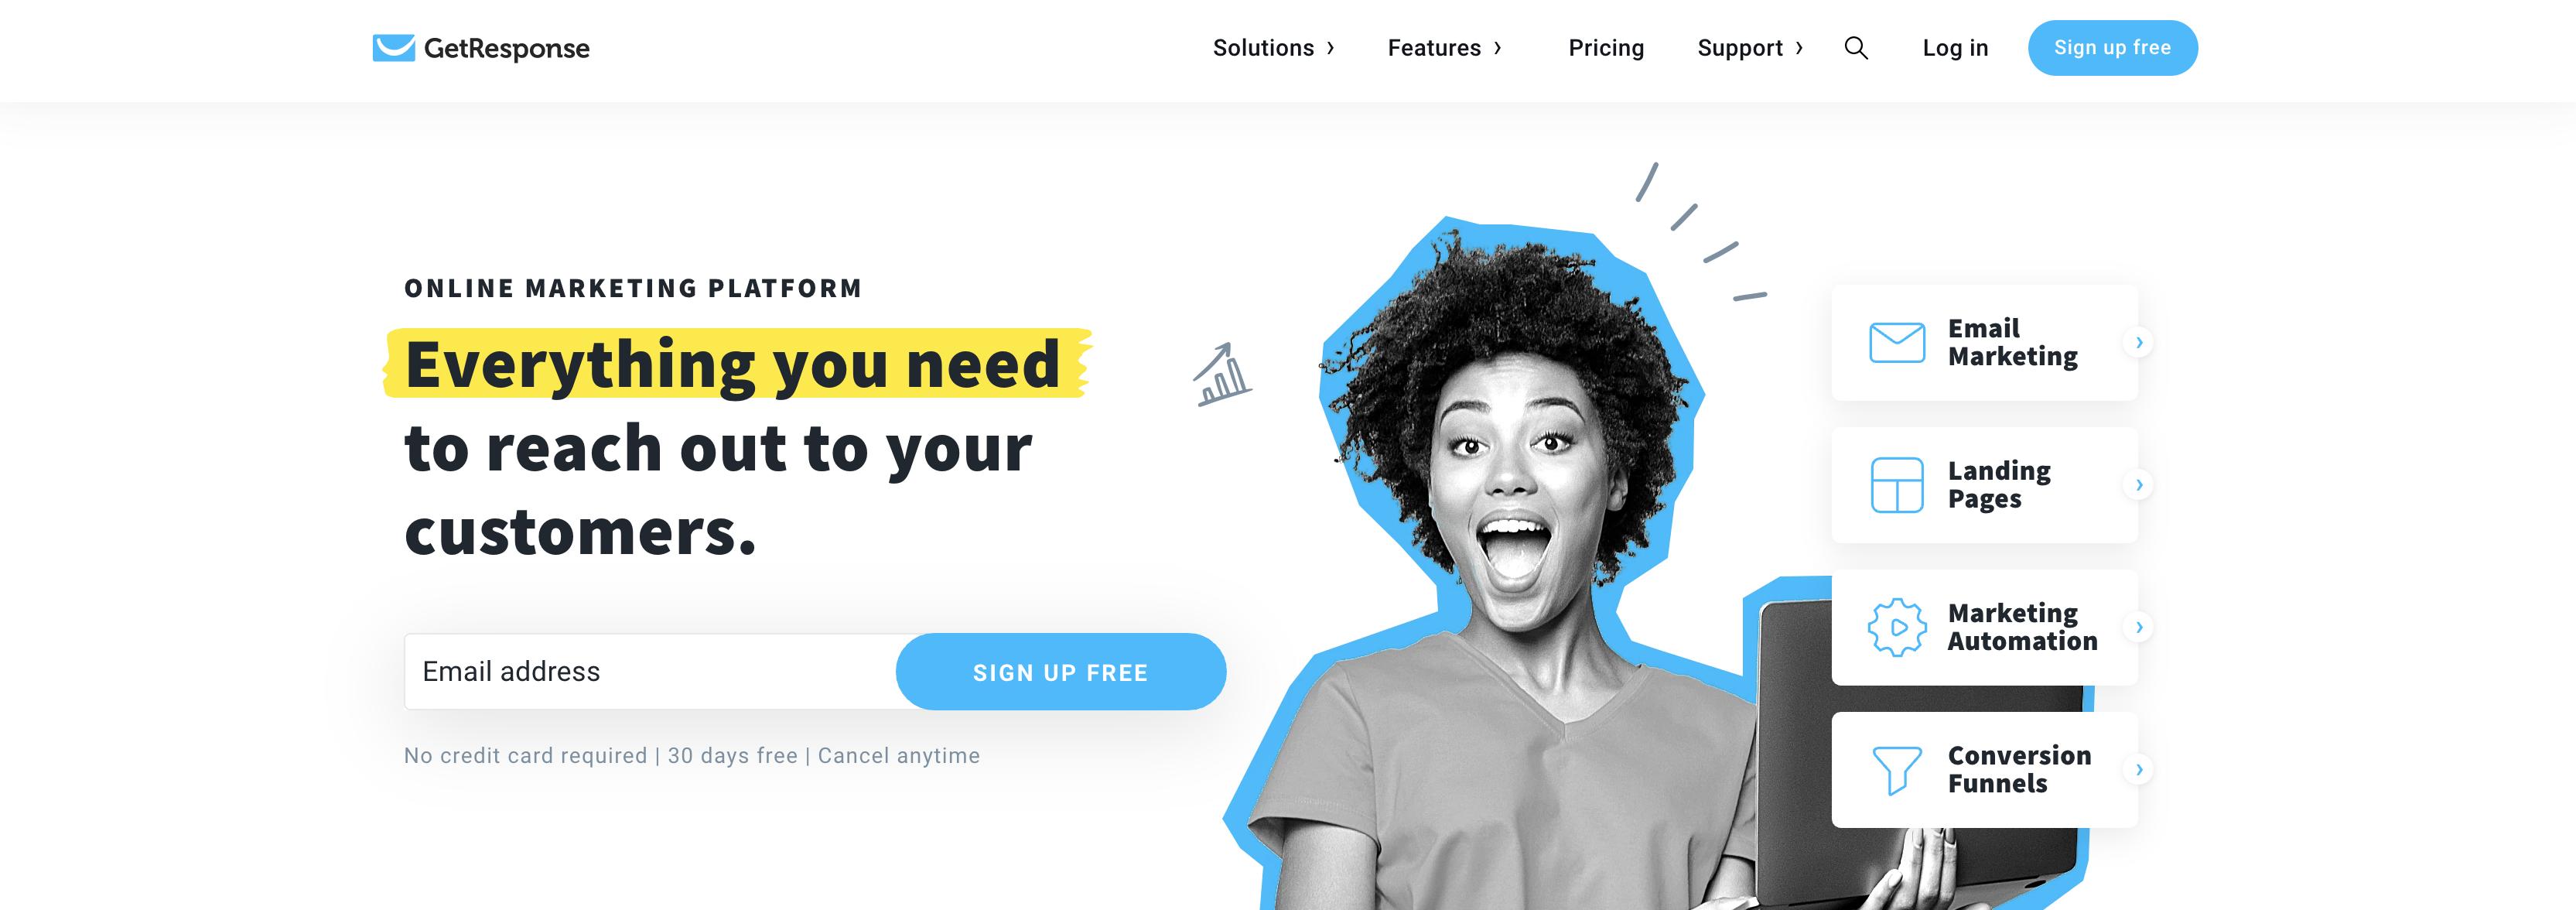 GetResponse homepage screenshot